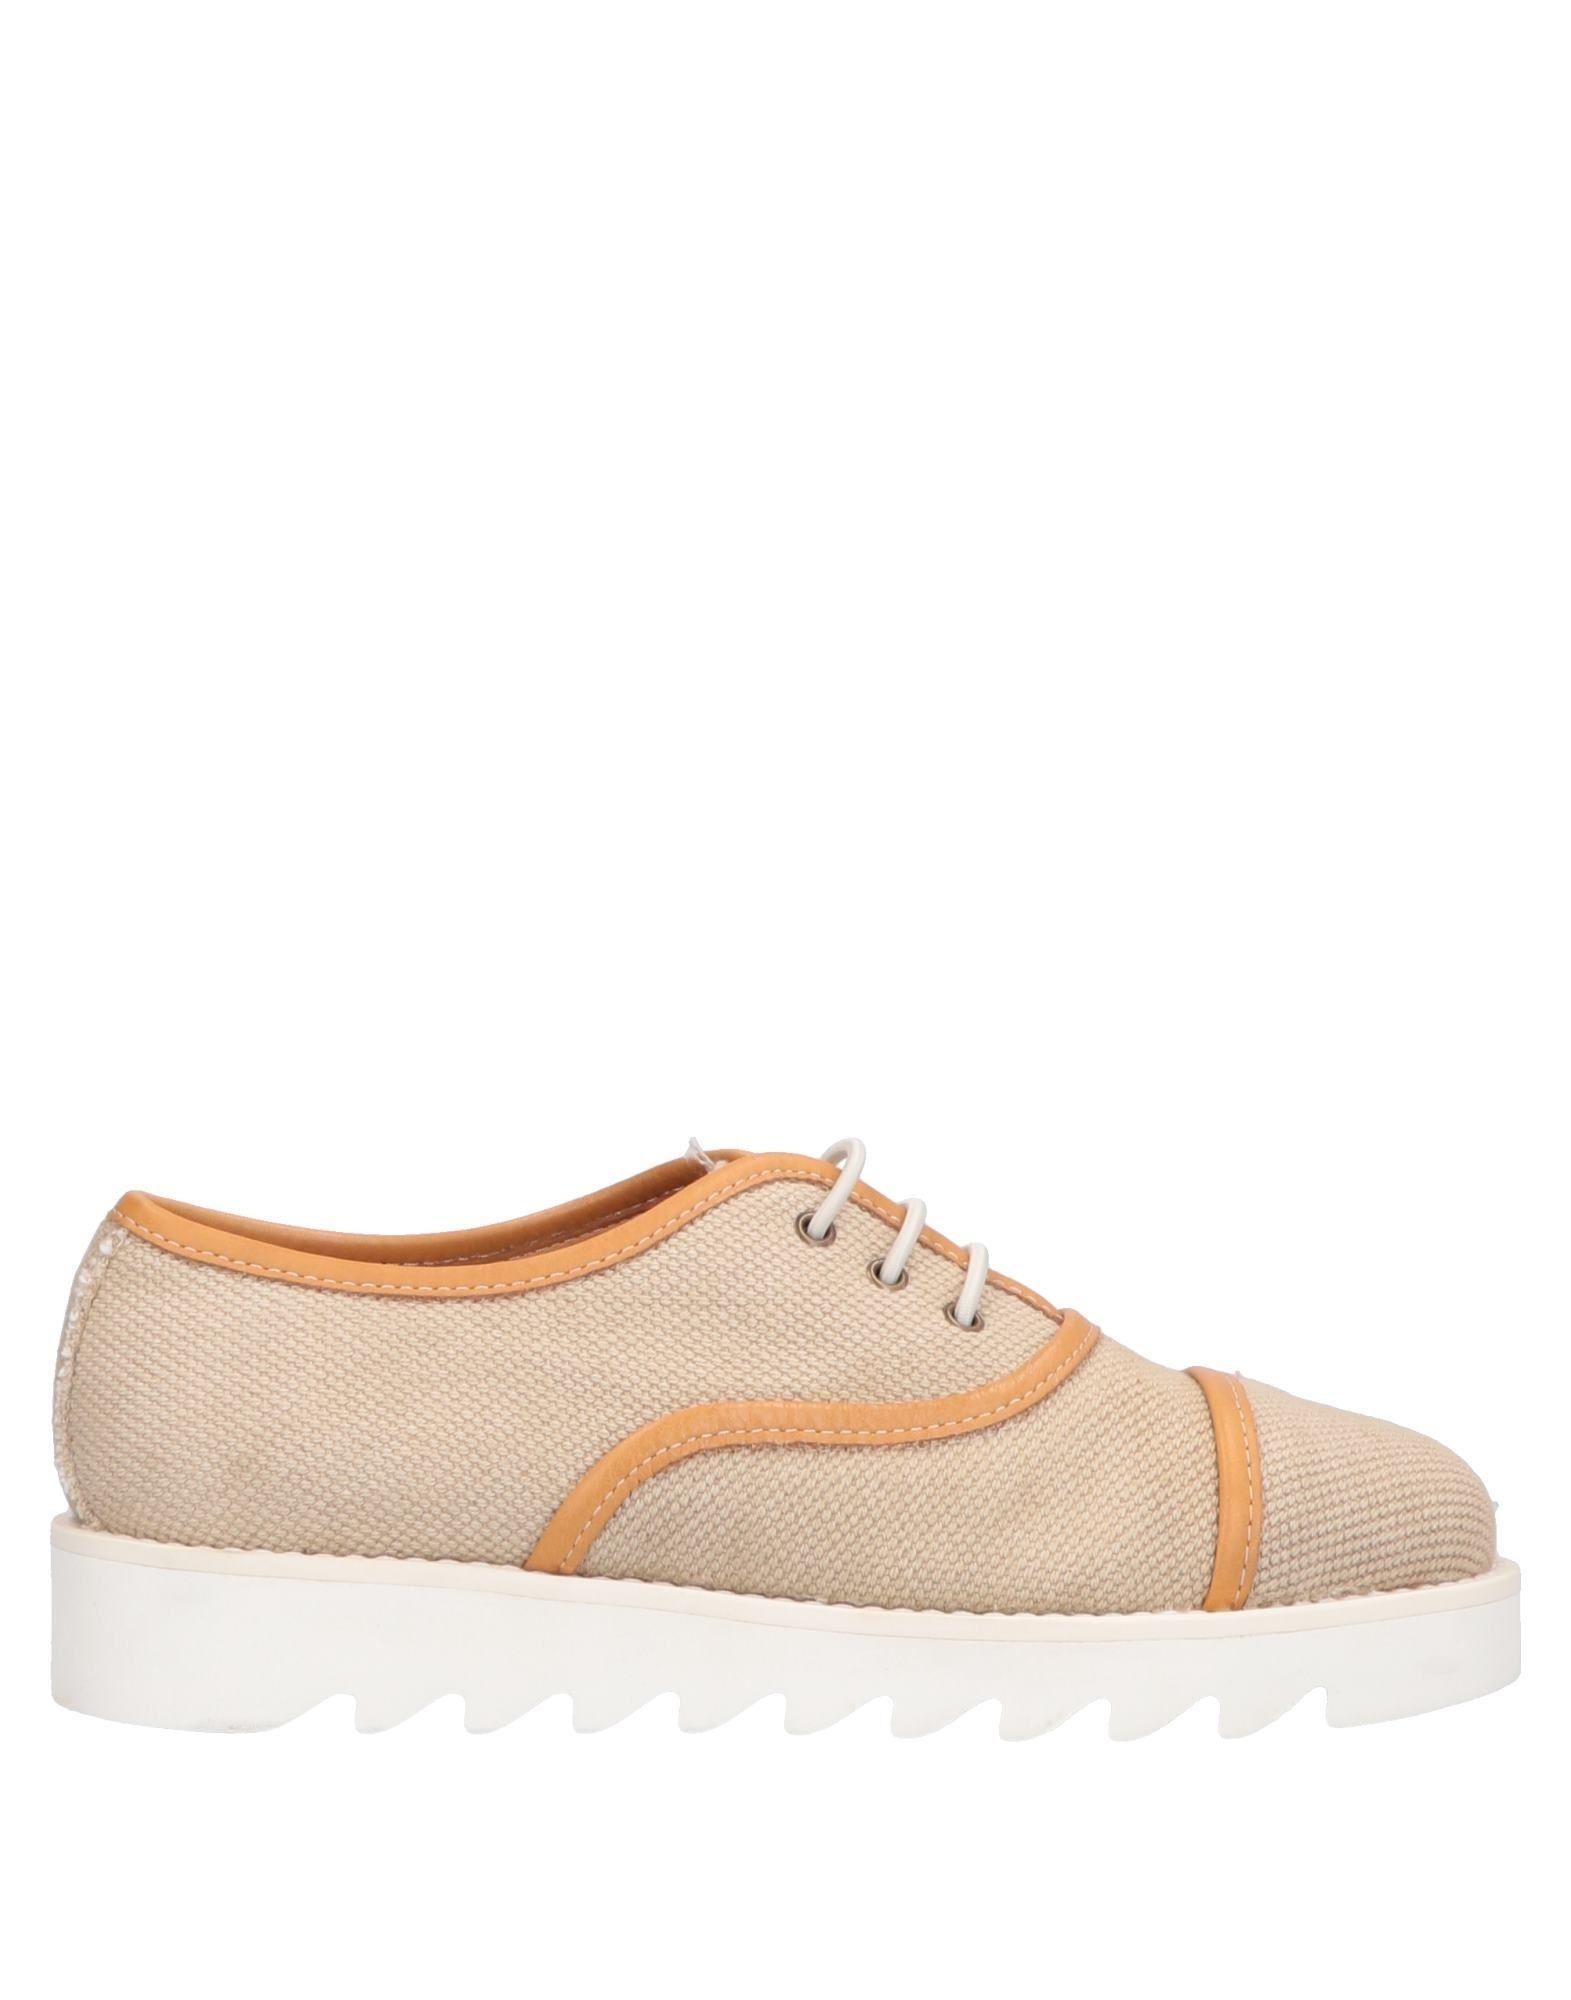 Фото - ( VERBA ) Обувь на шнурках обувь на высокой платформе dkny